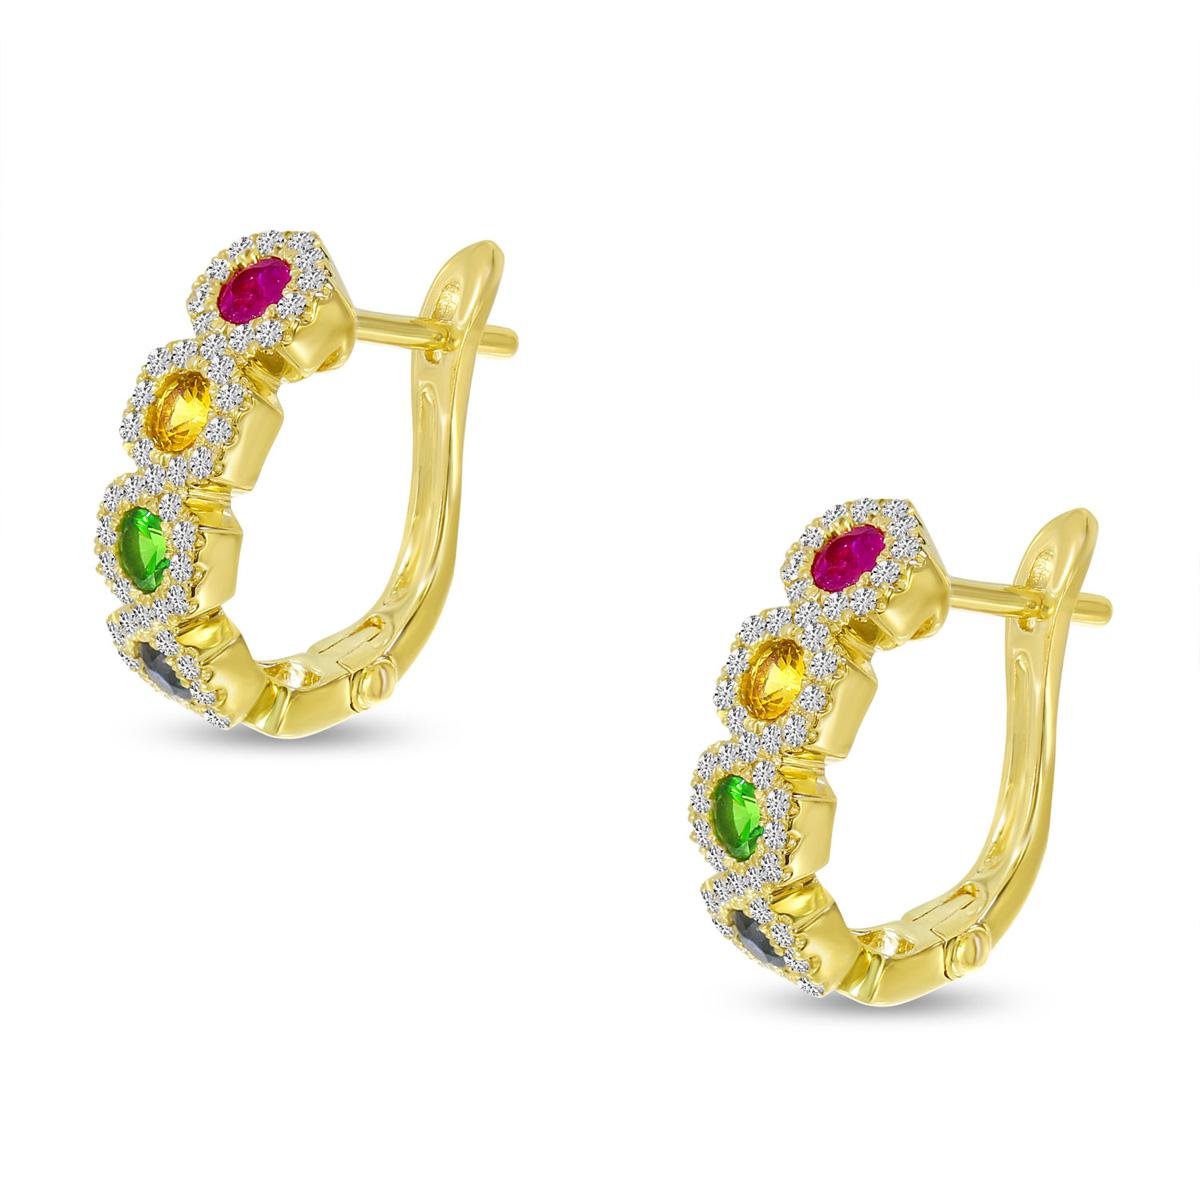 14K Yellow Gold Rainbow Sapphire Hexagon Earrings